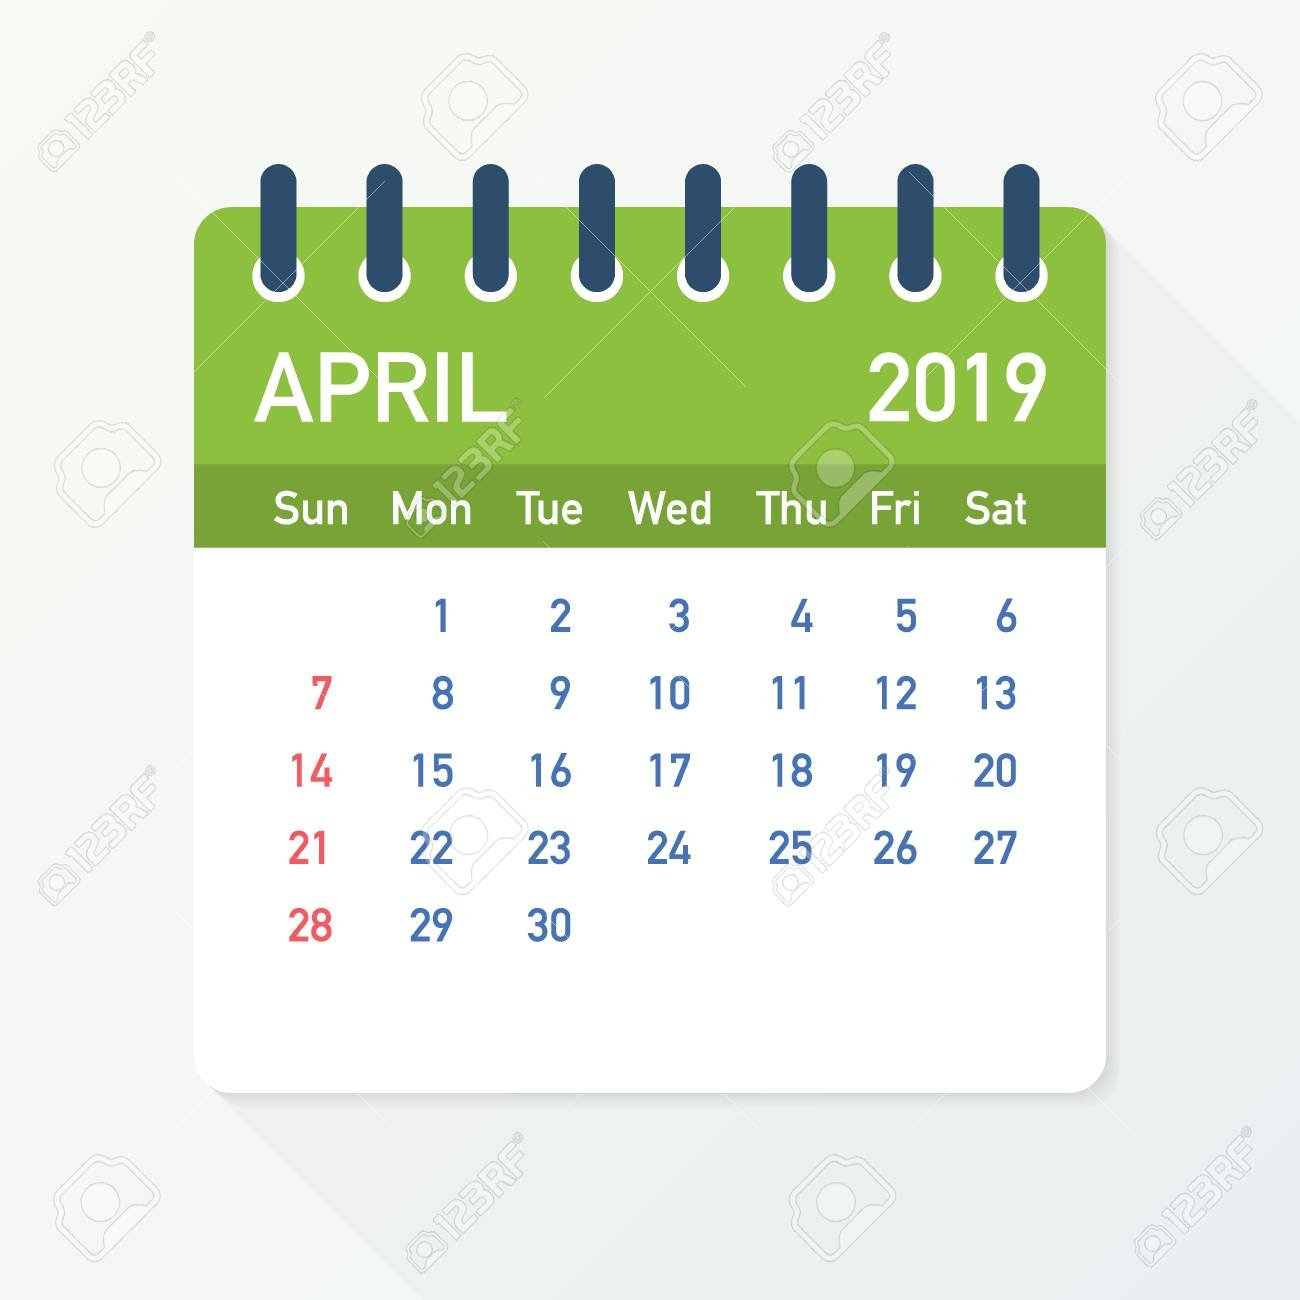 April 2019 Calendar Leaf. Calendar 2019 In Flat Style. Vector April 5 2019 Calendar